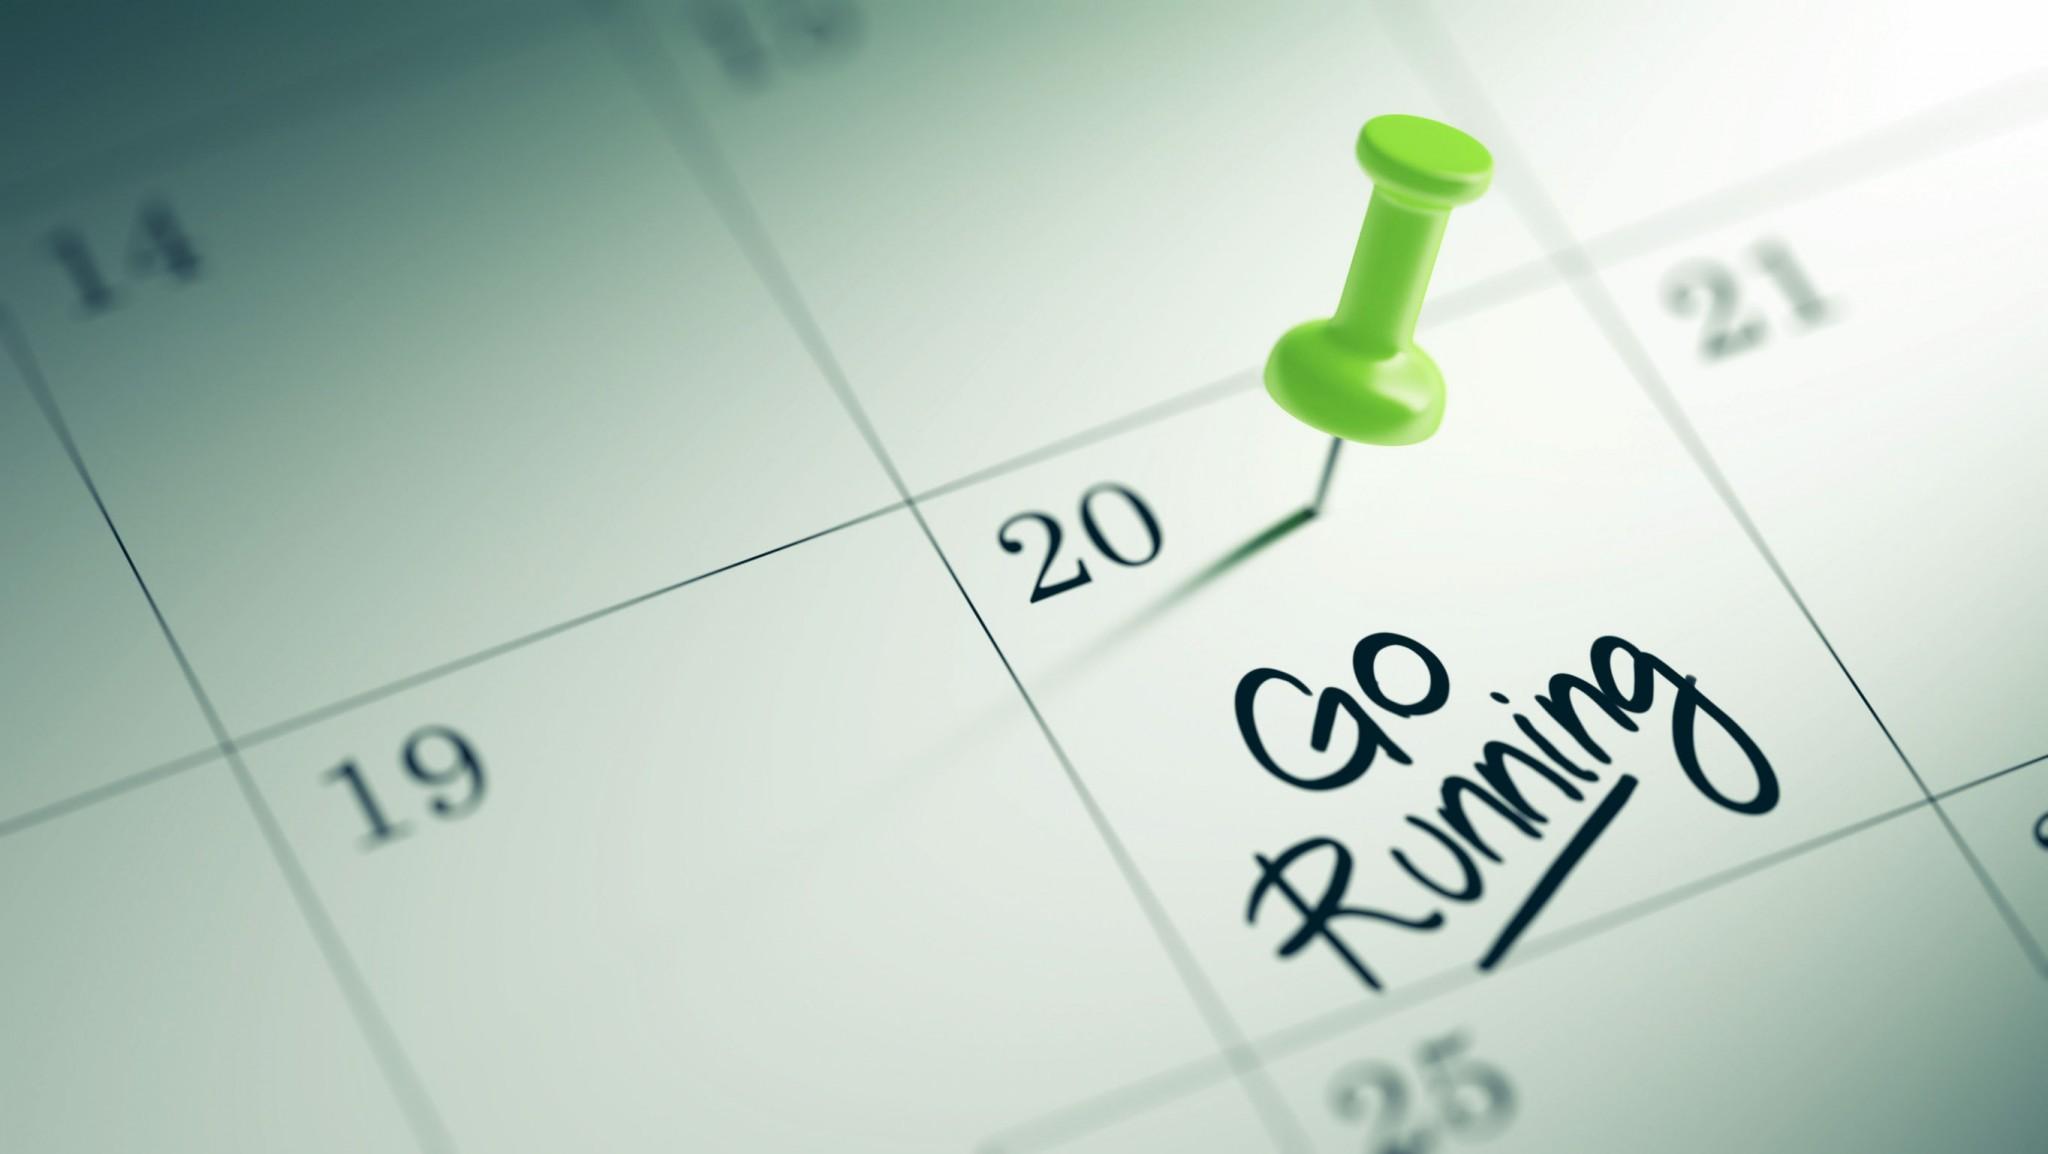 plan go running calendar